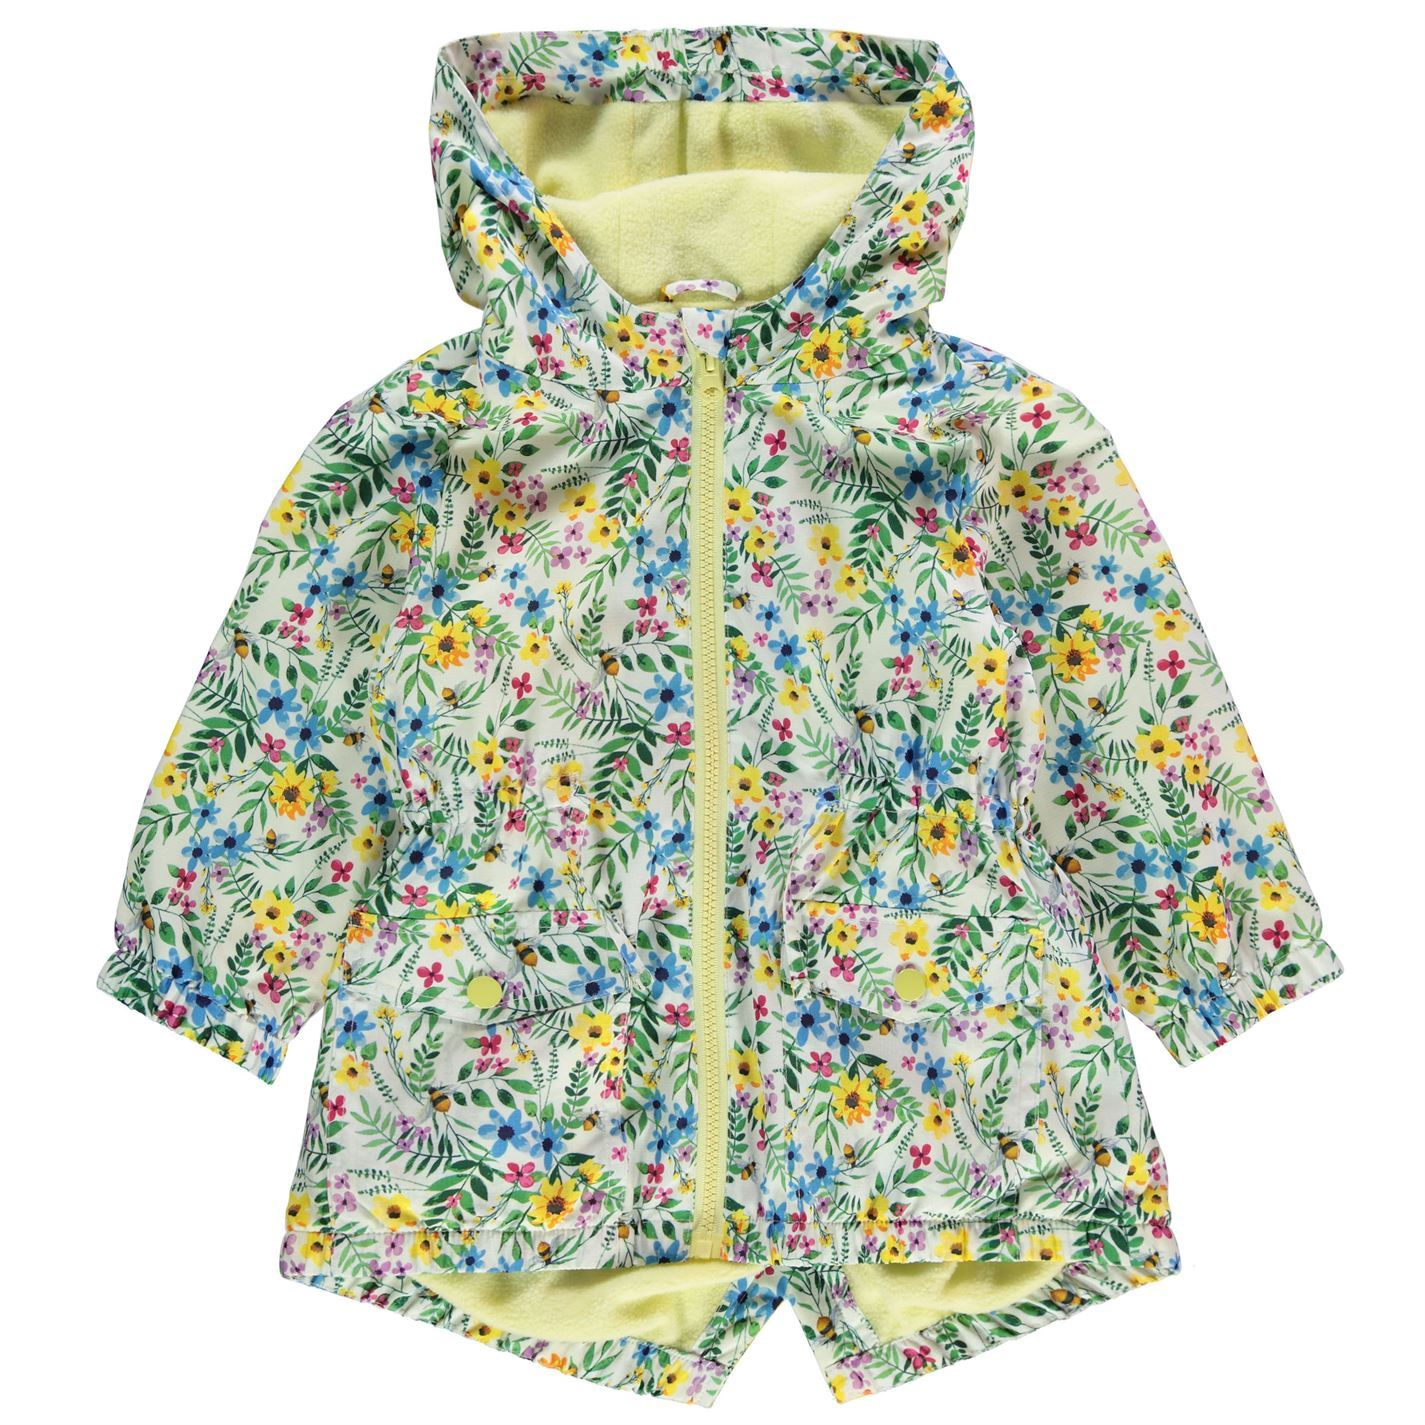 9c3f0d300 Crafted Kids Girls Rain Mac Infant Jacket Coat Top Long Sleeve Water ...